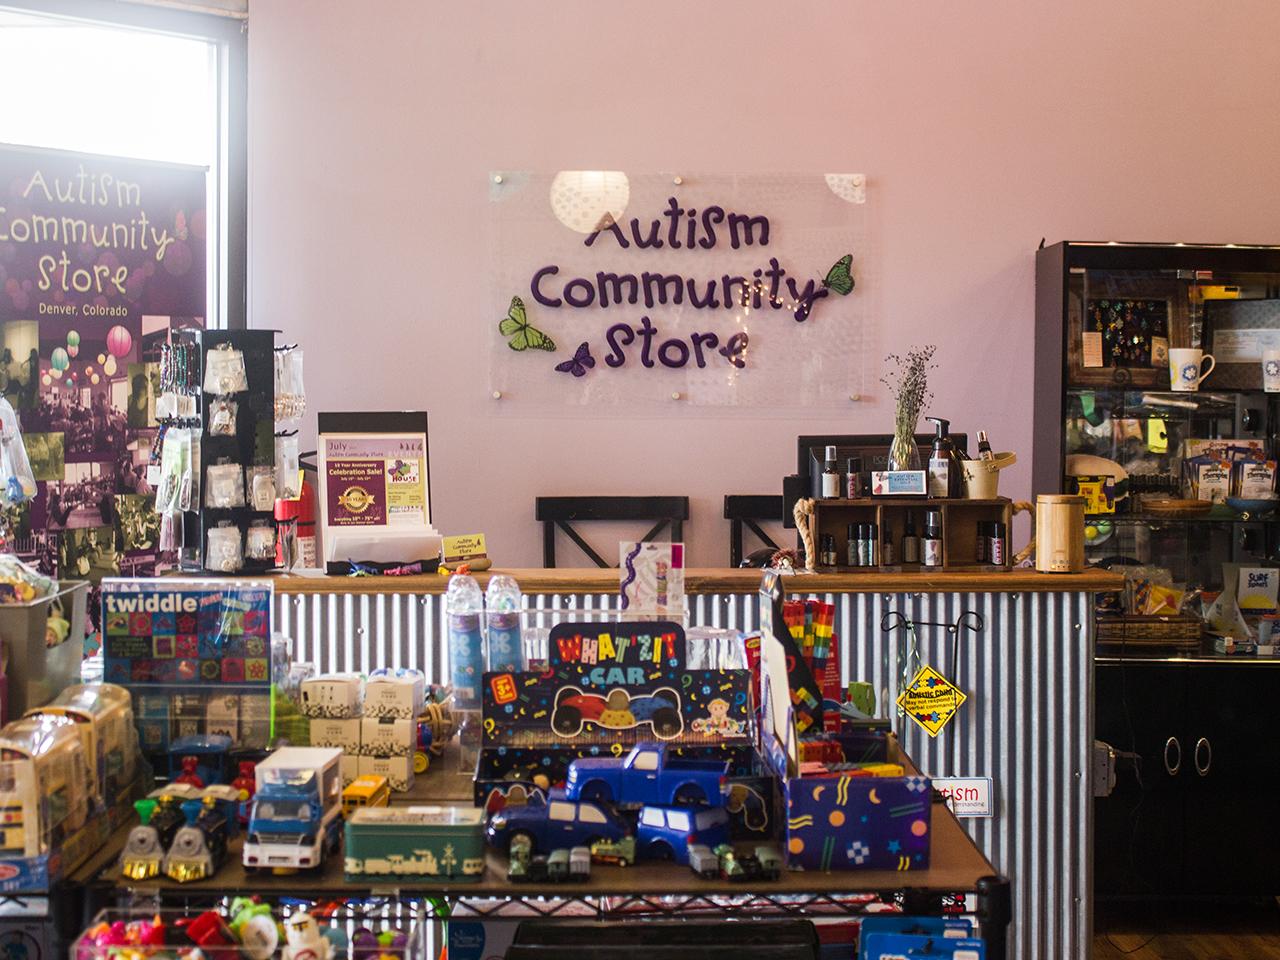 Autism Community Store